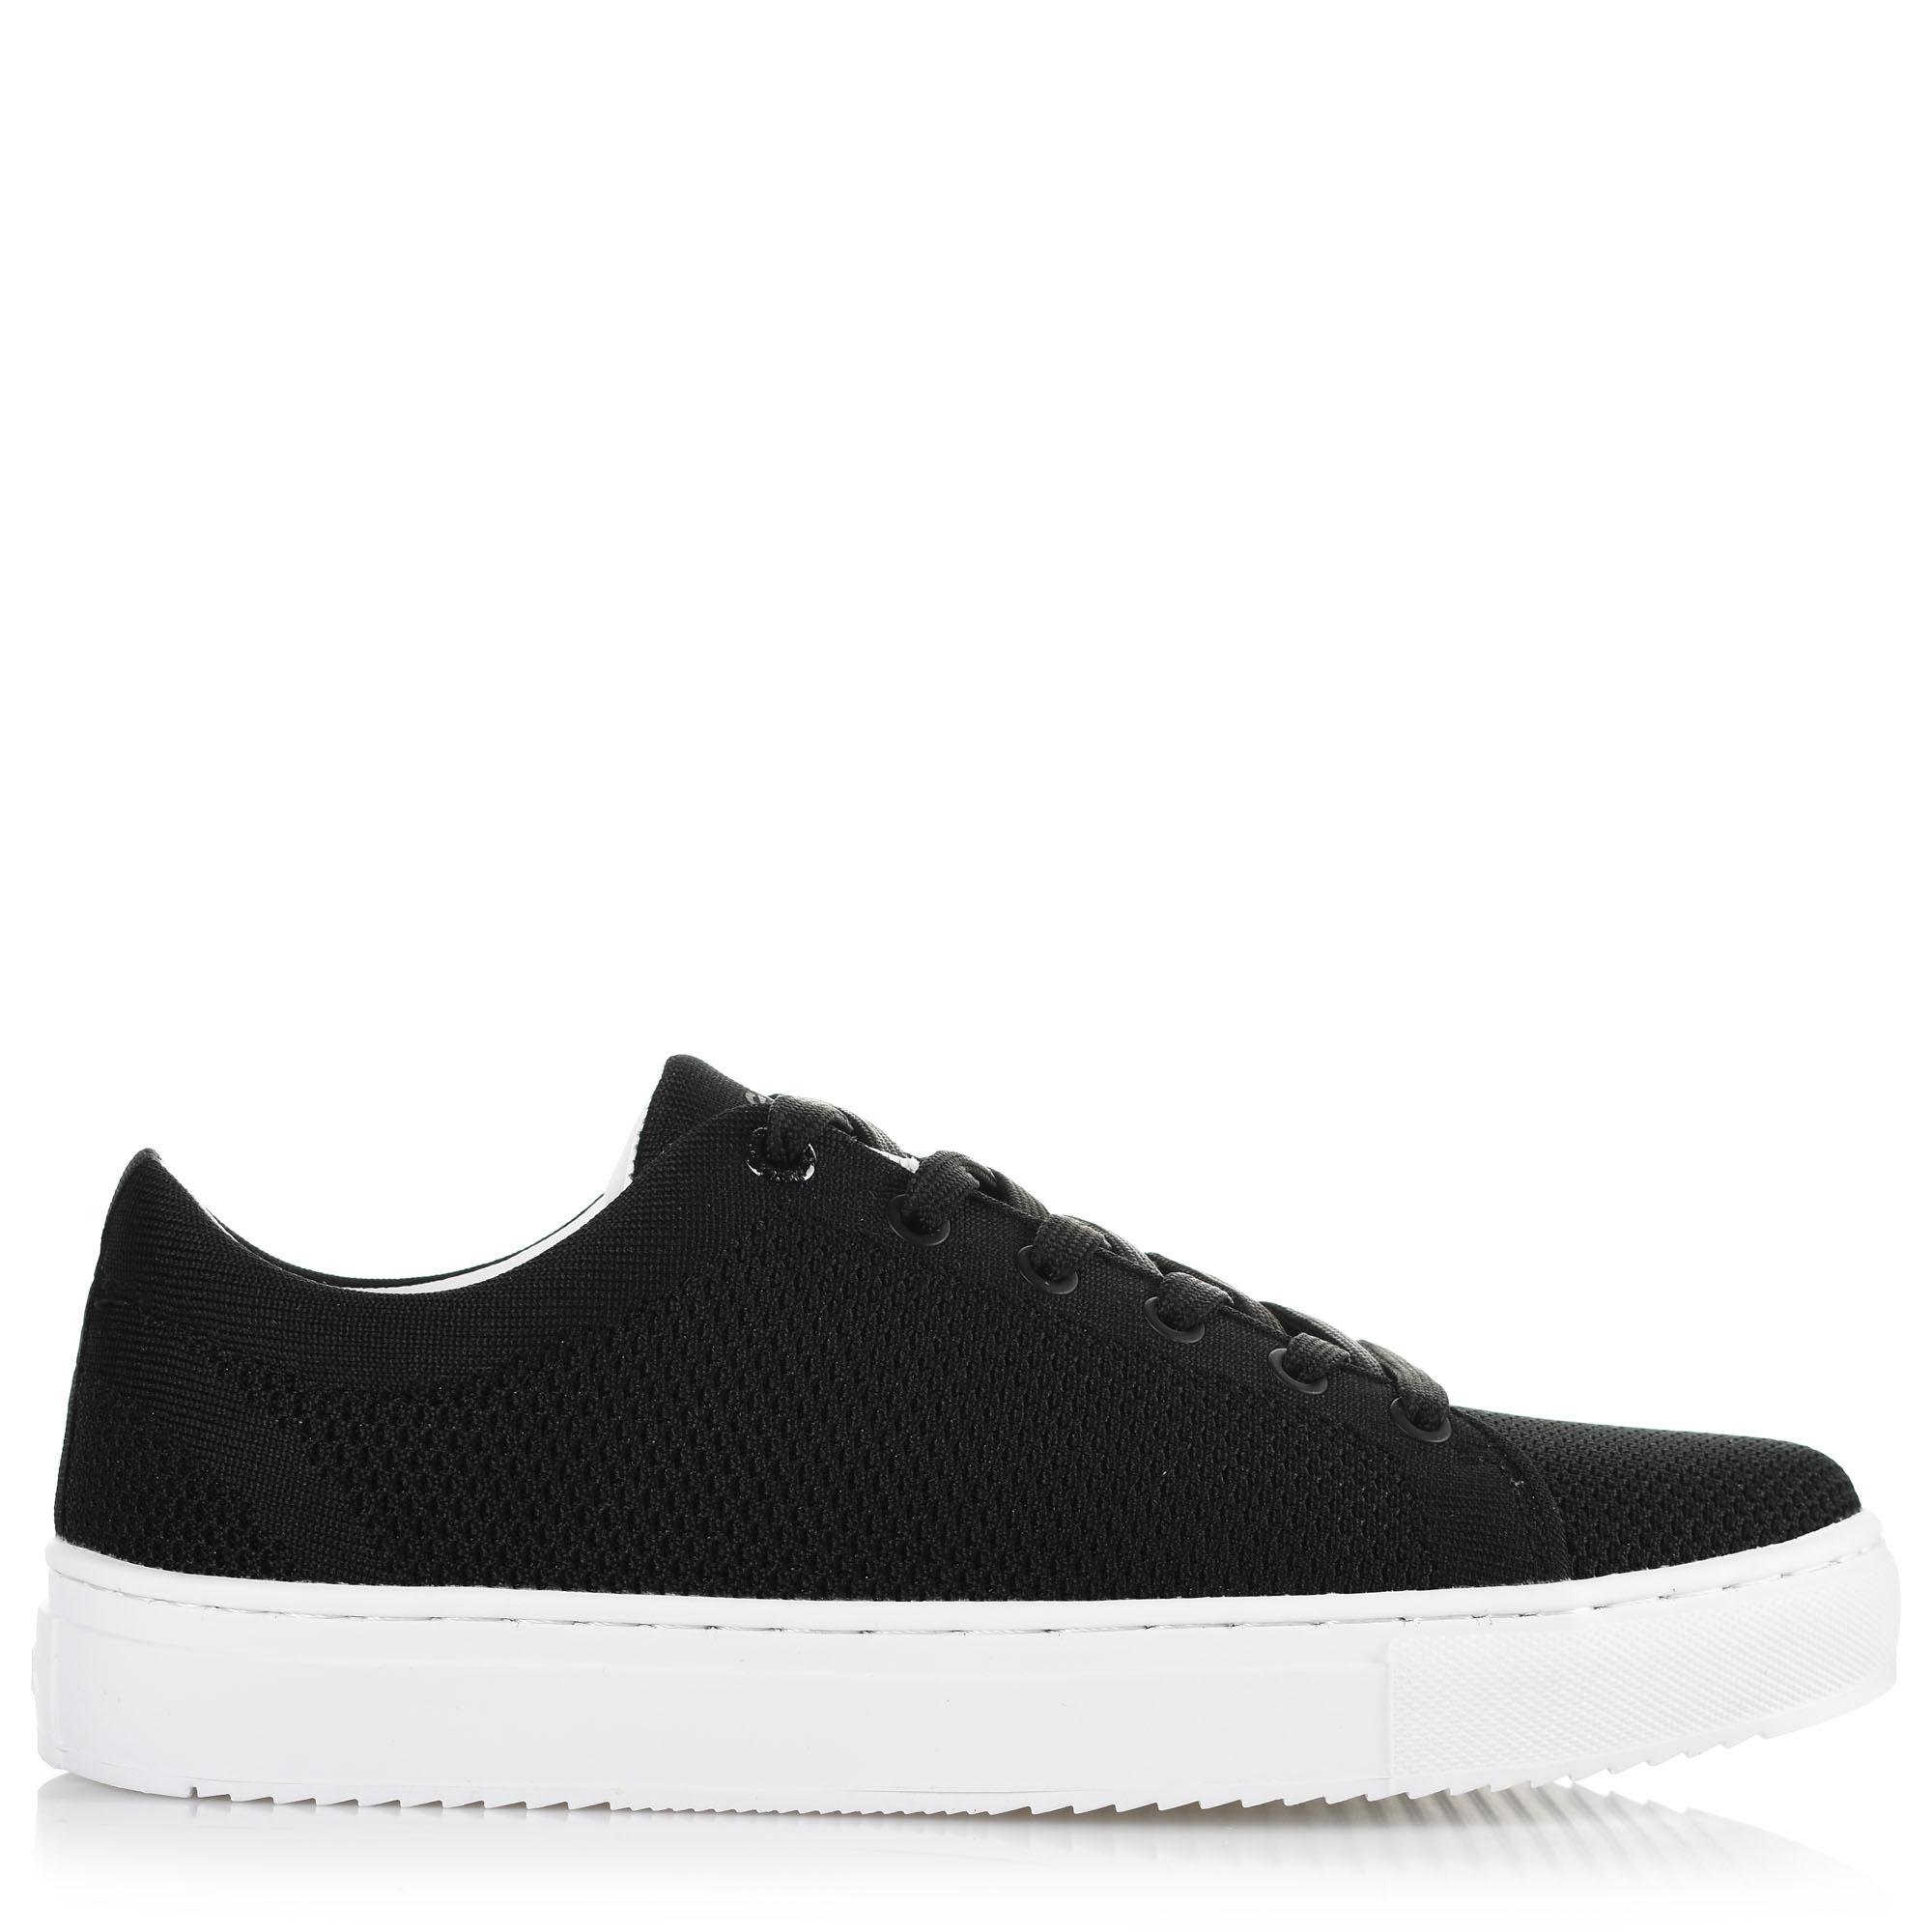 Sneakers Mexx Casper MXQP0102 ανδρας   ανδρικό παπούτσι